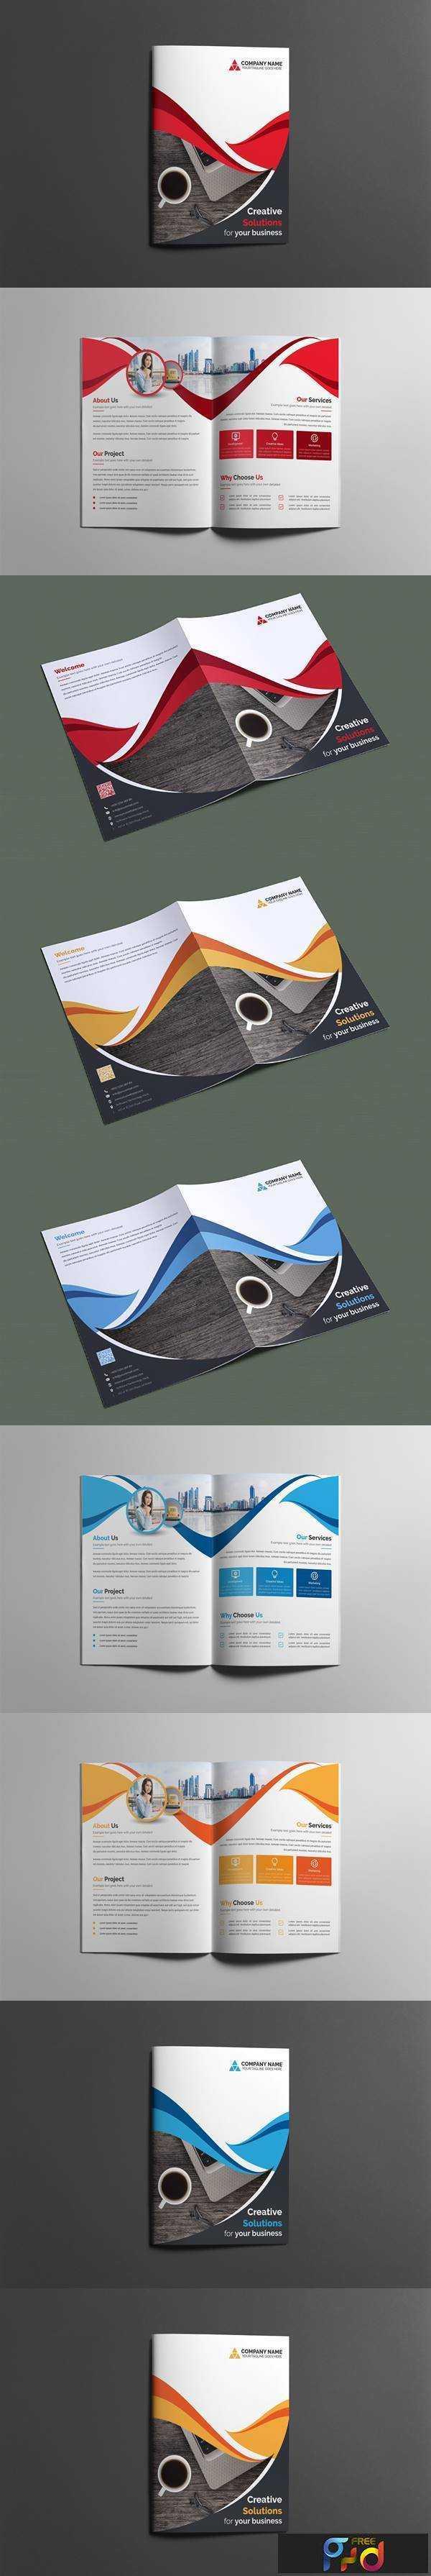 1805226 Bifold Brochure 2256355 1